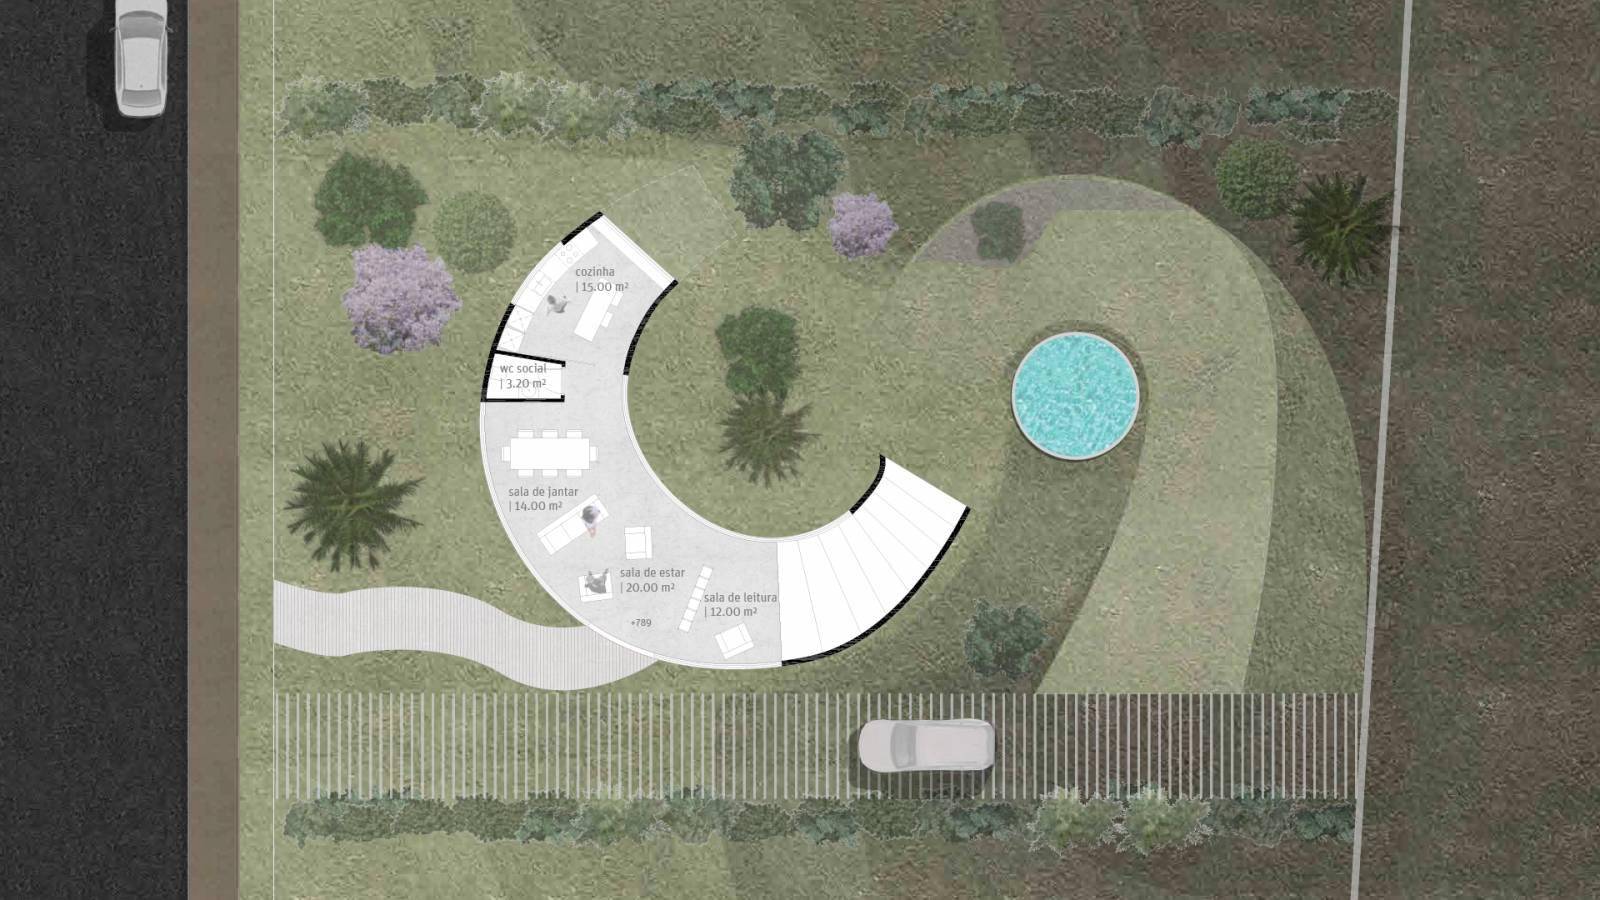 HOUSE #6 - LEVEL 4 PLAN - 6 case study houses - SPOL Architects